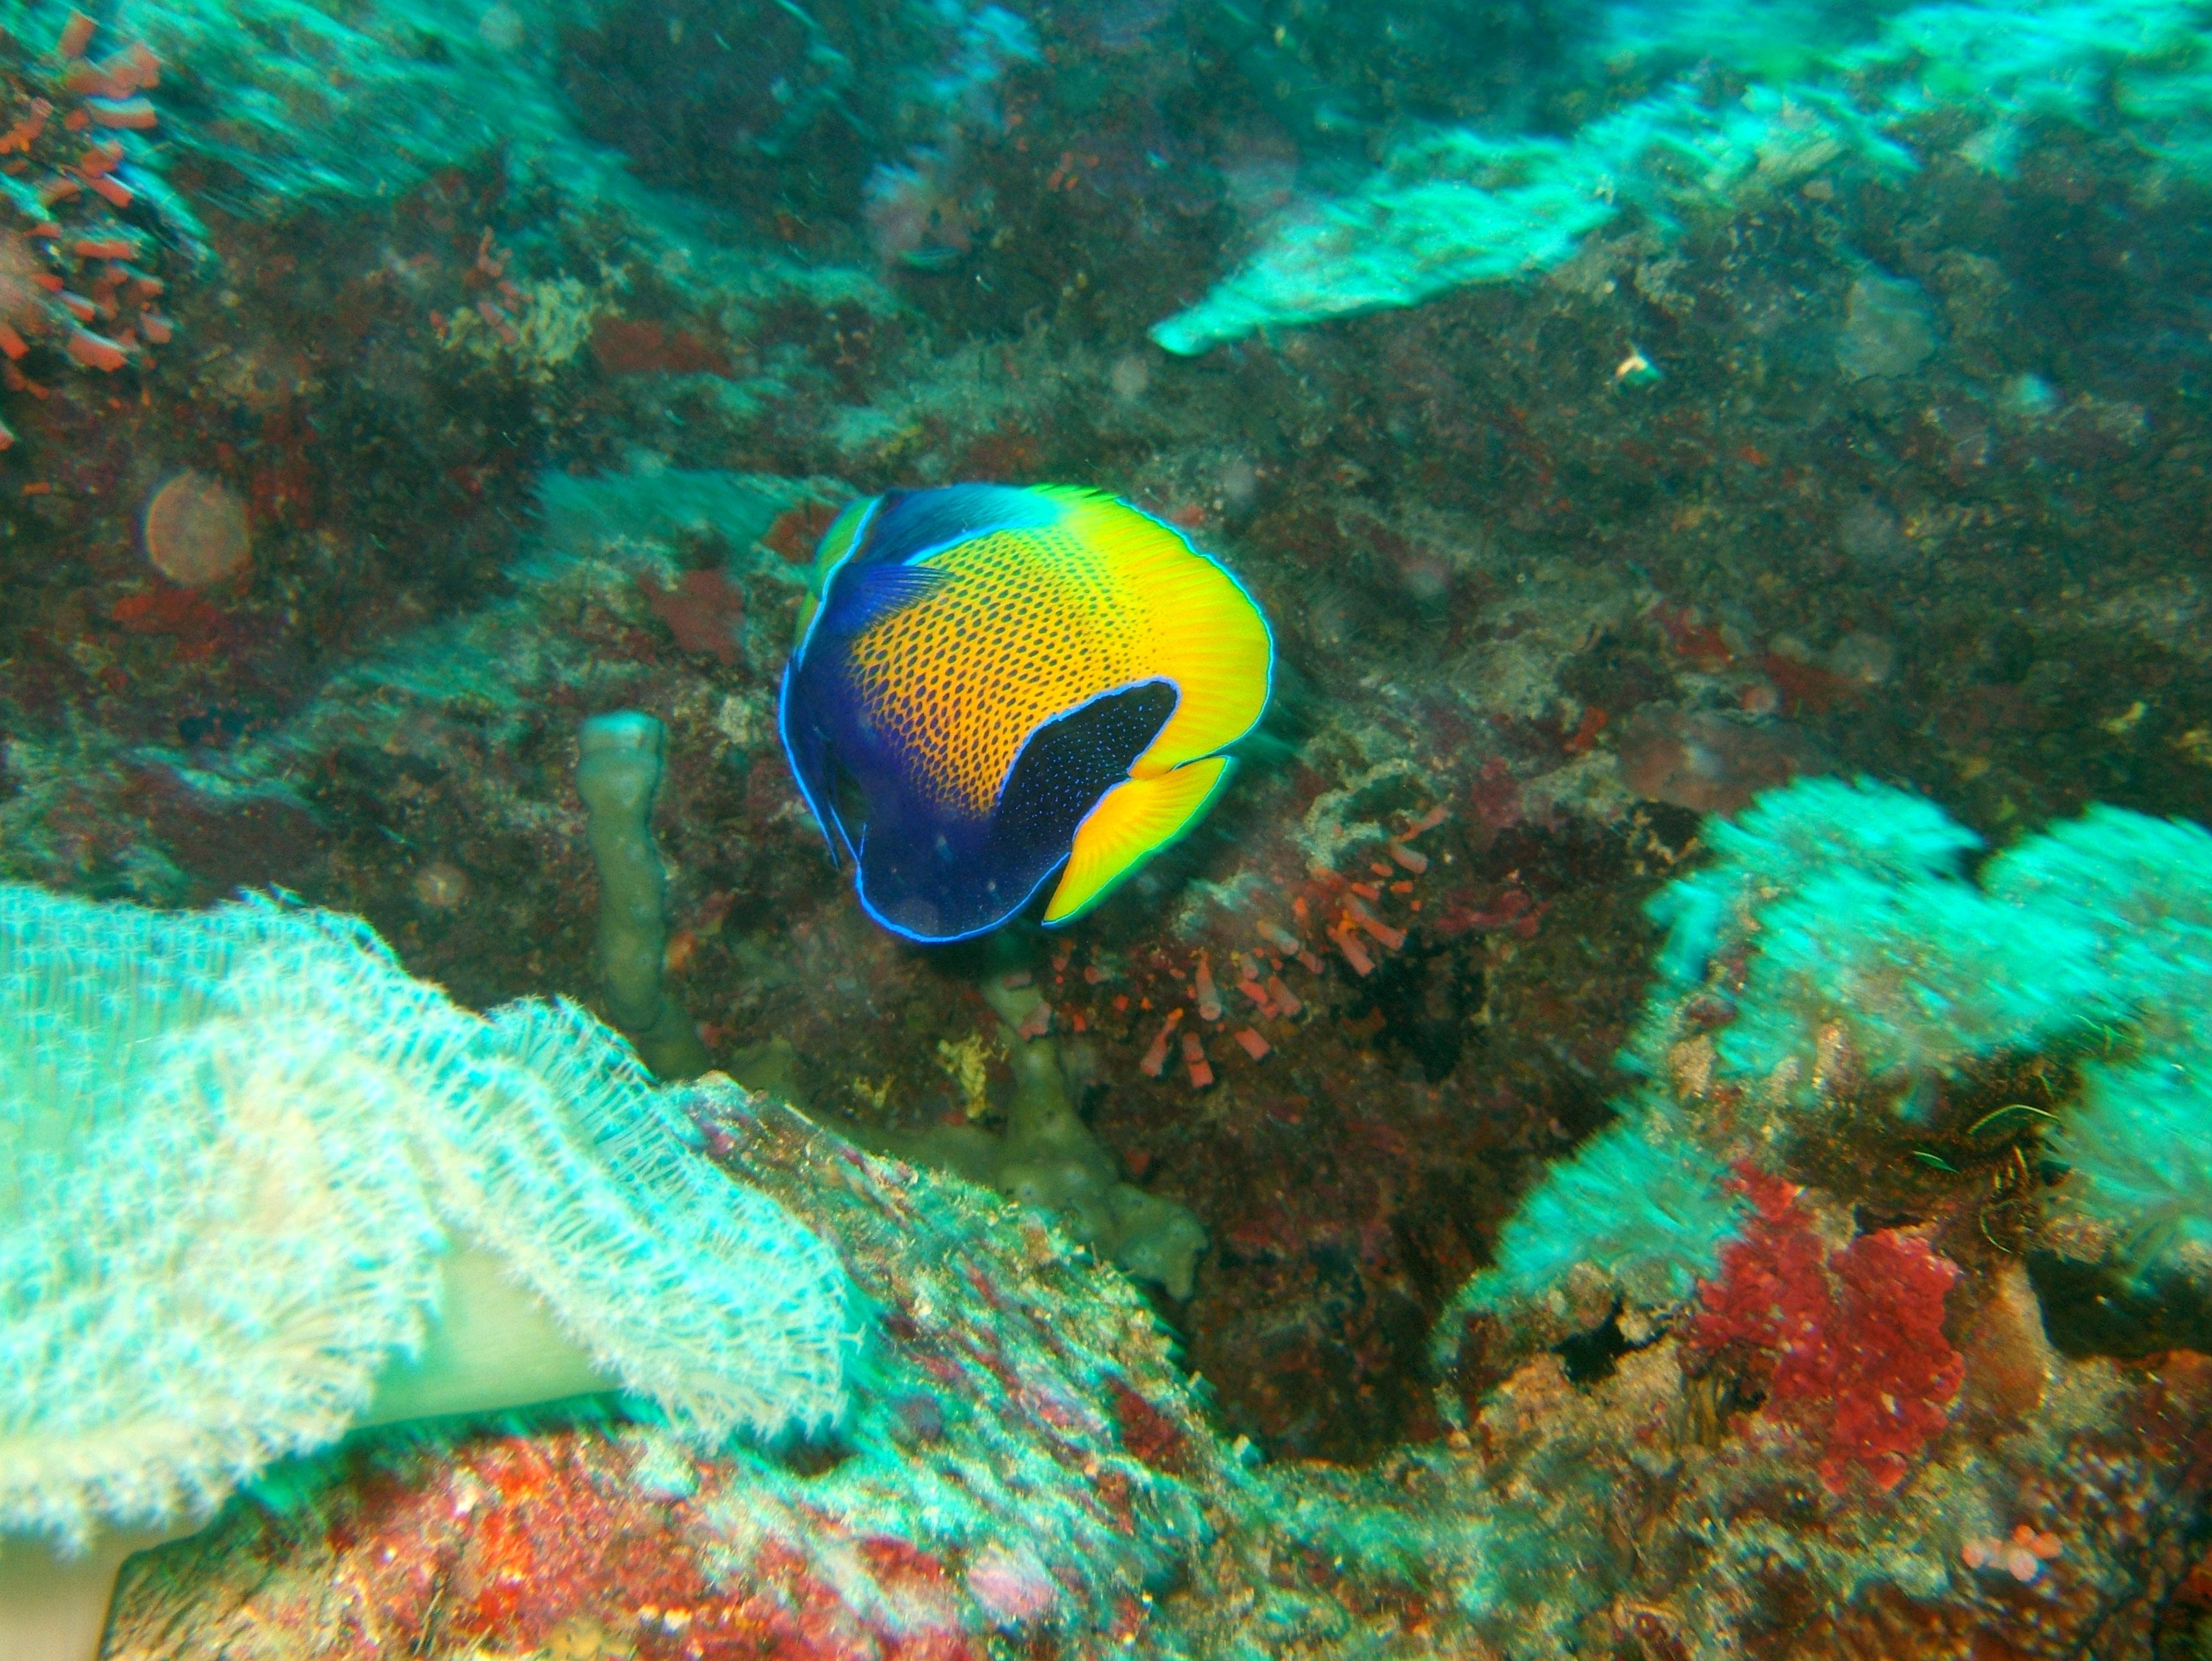 Philippines Cebu Bohol Balicasag Island Black Forest dive Dec 2005 14